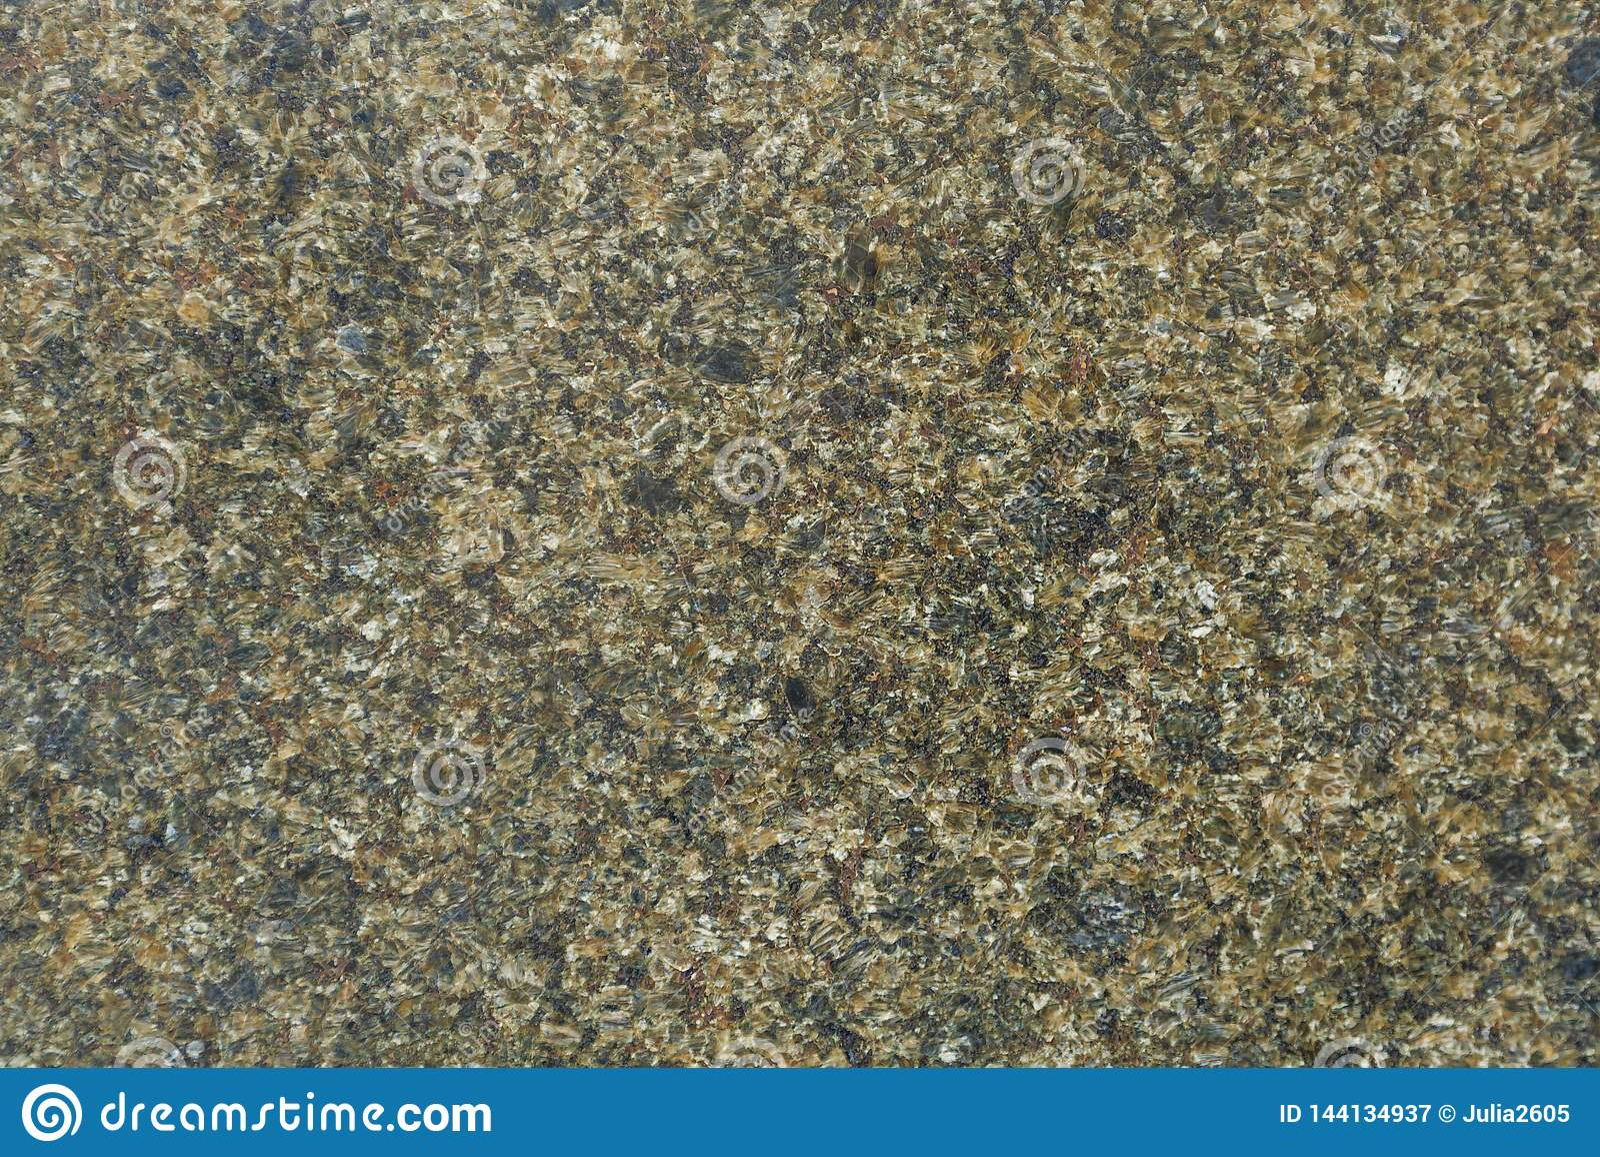 Kamienna tekstura granitu marmuru zieleń